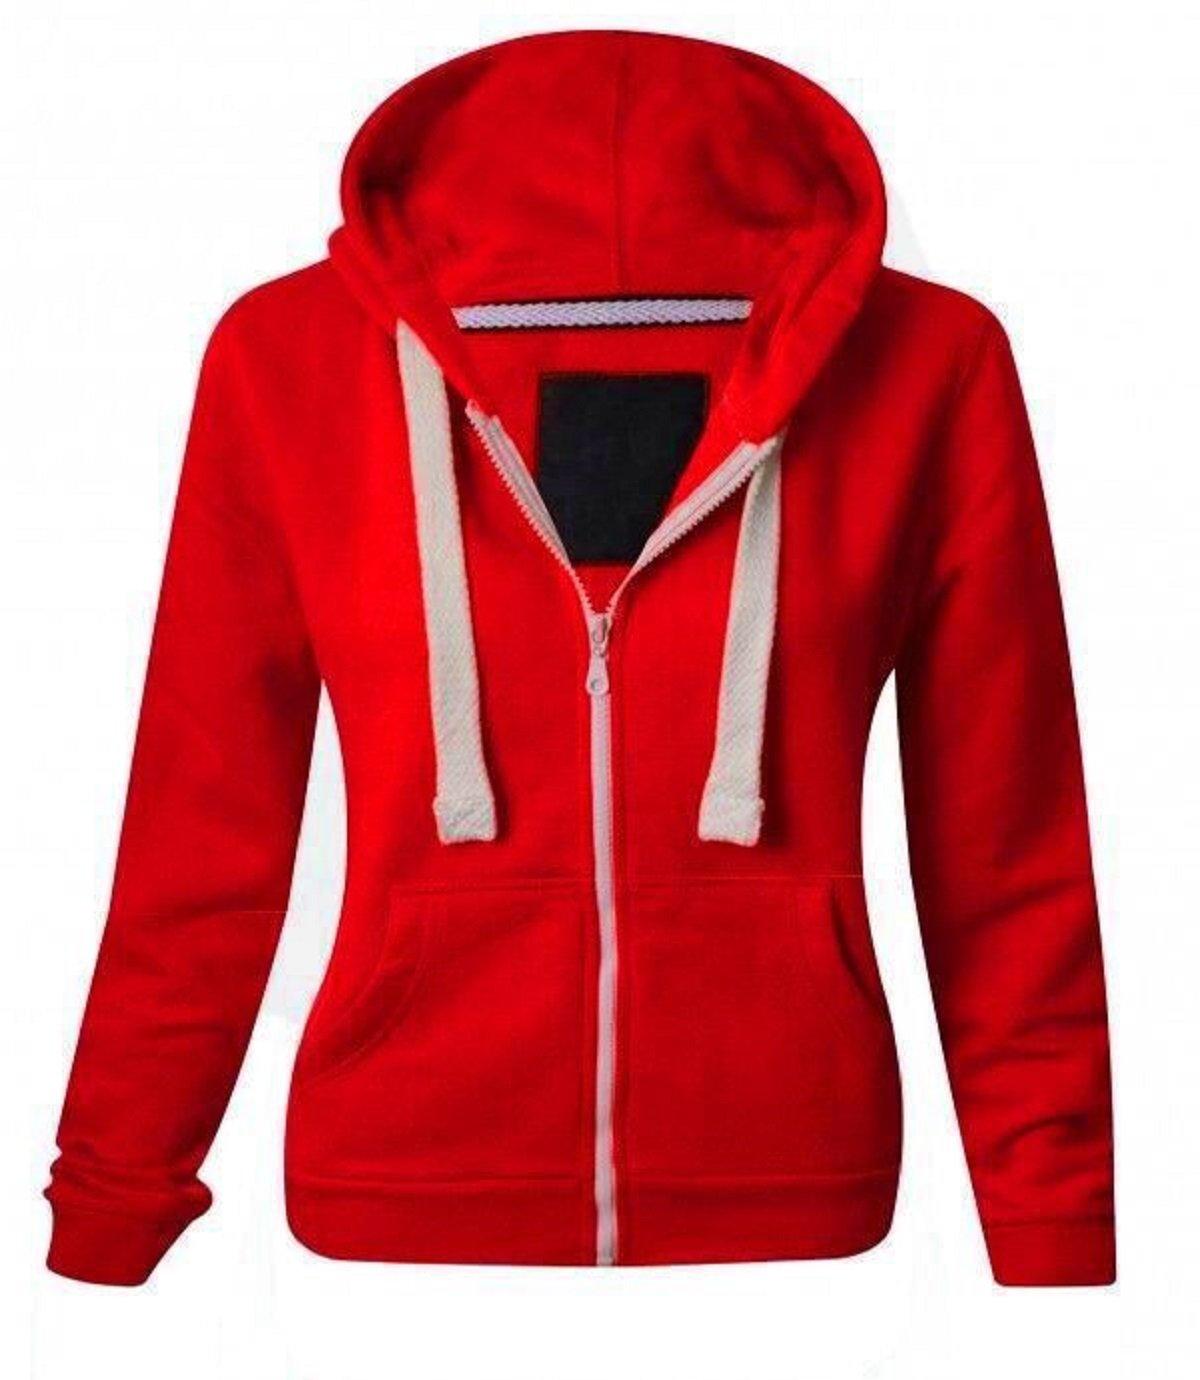 ZJ FASHIONS Kids Girls & Boys Plain Fleece Hoodie Zip up Zipper (11/12, Red)